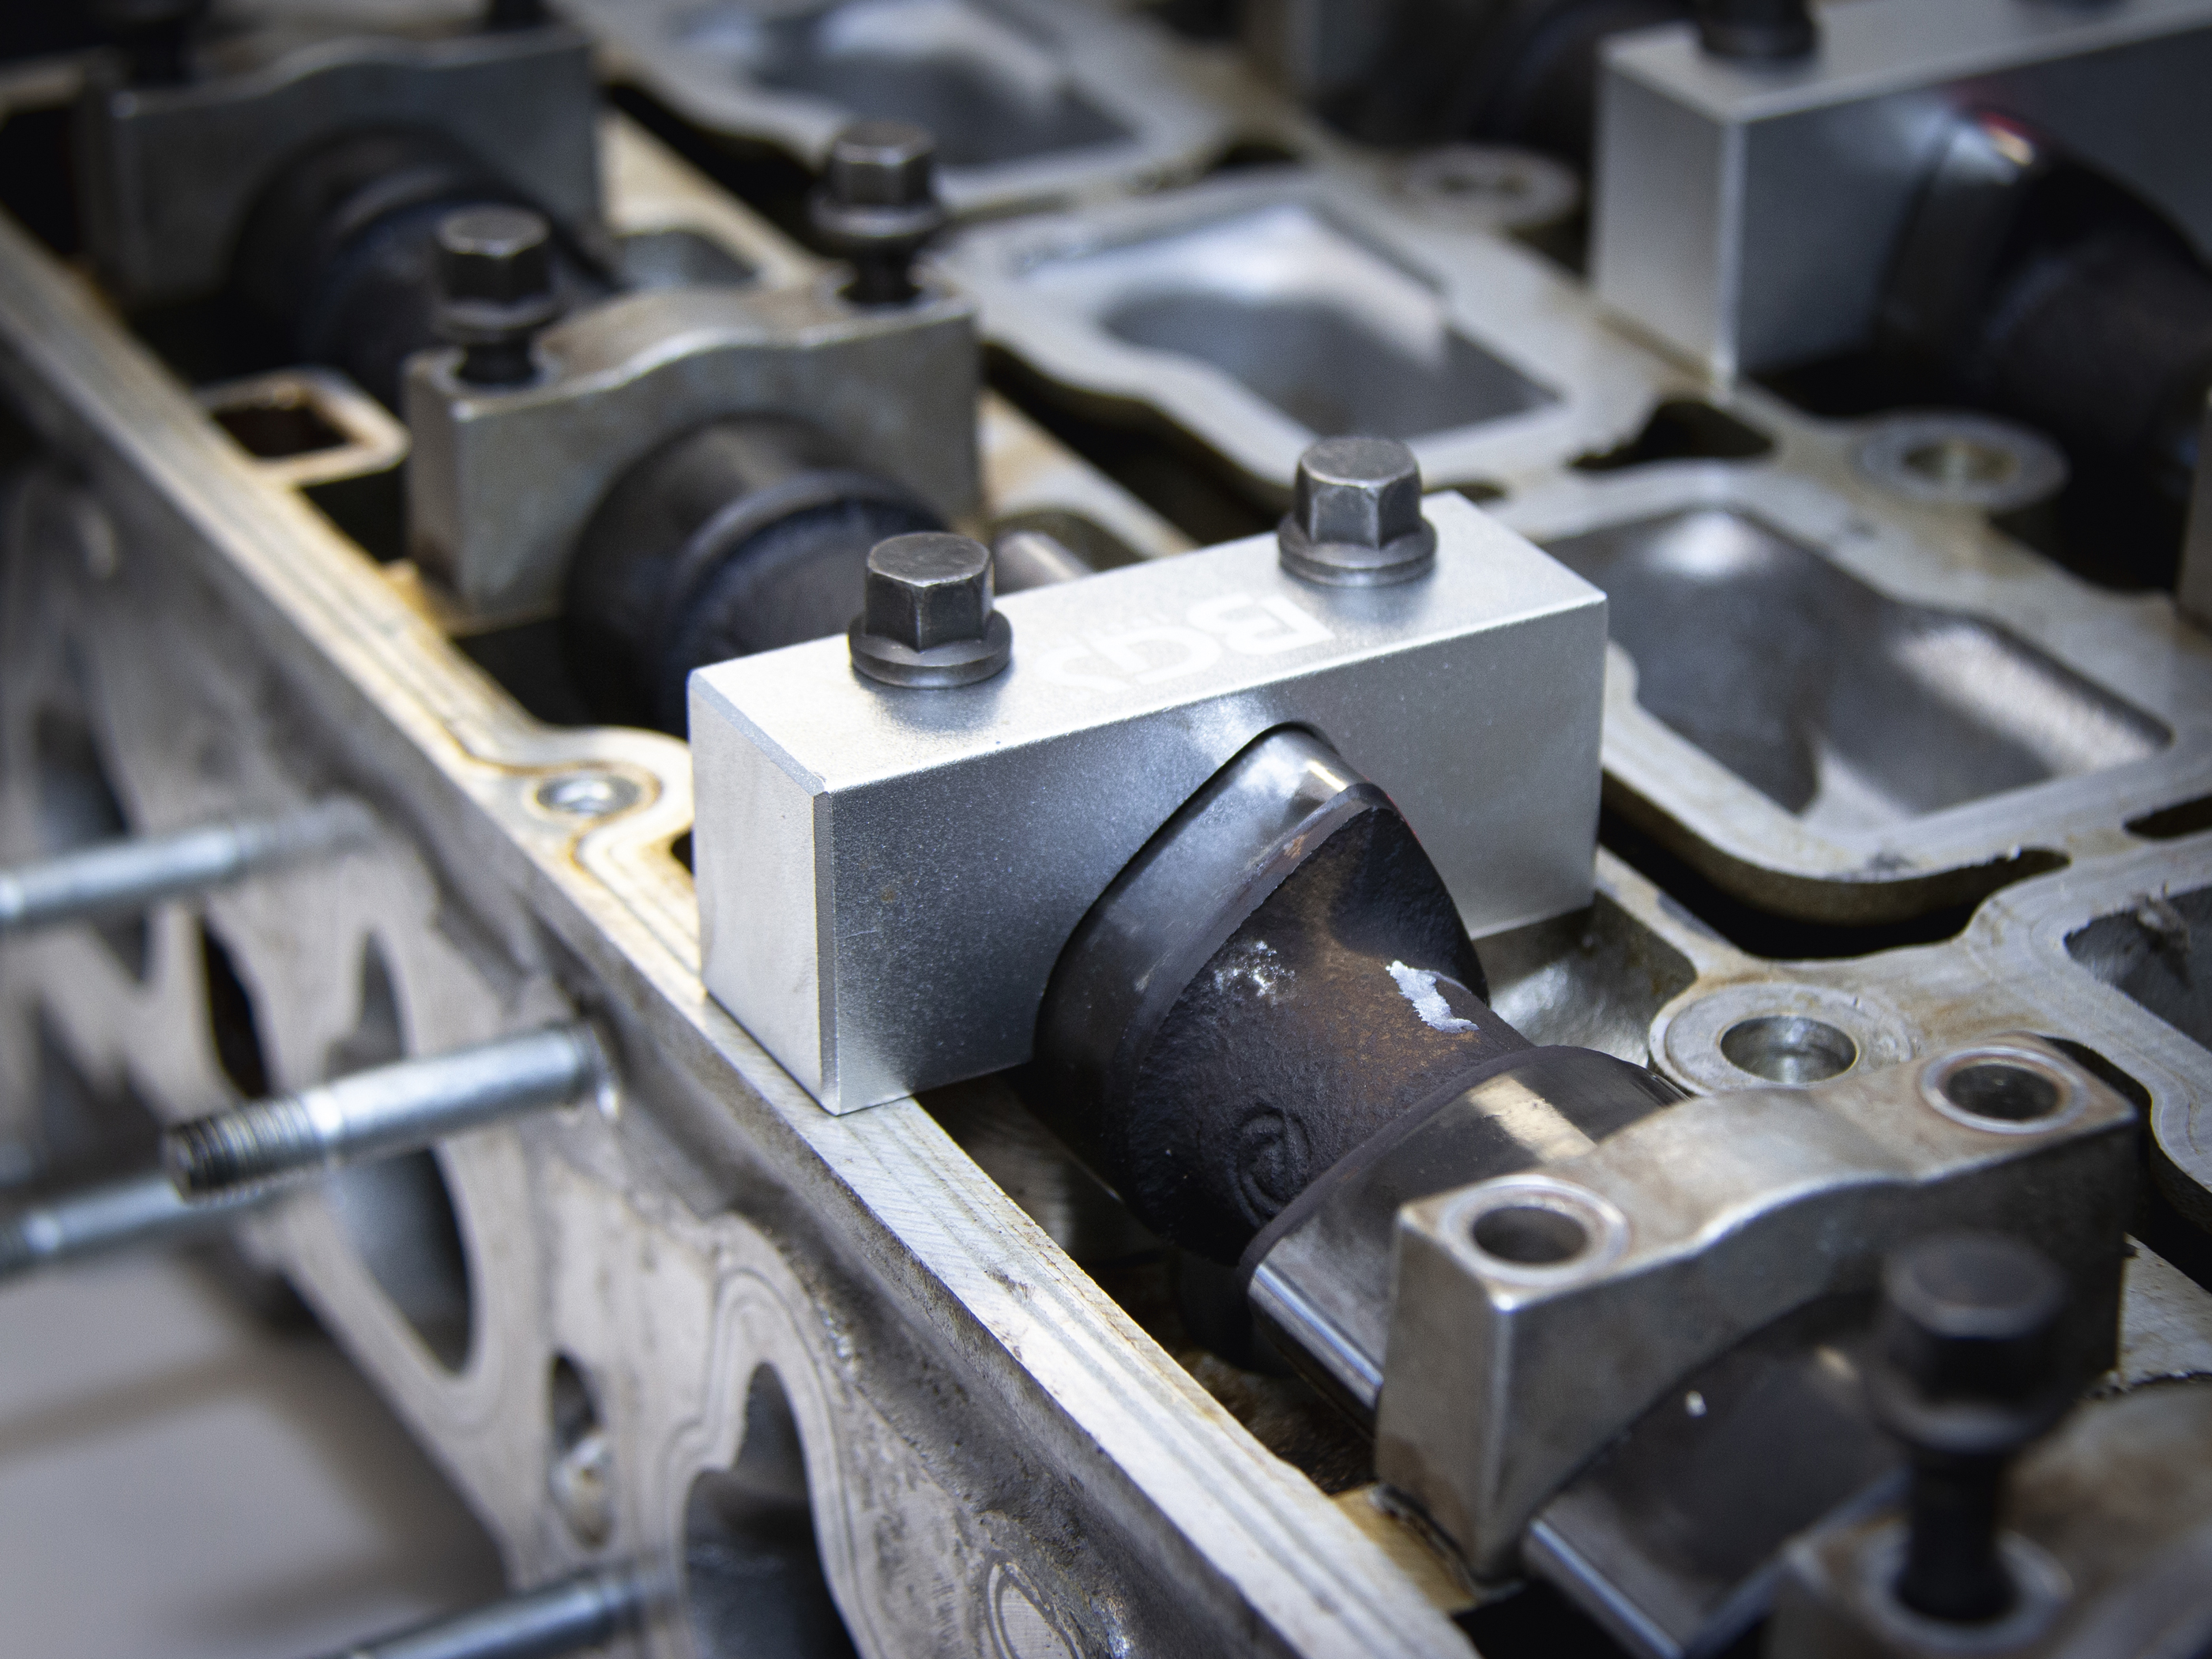 Tool Tray 1/6: Camshaft Locking Tool Set | for Alfa Romeo 147 1.6 105 HP